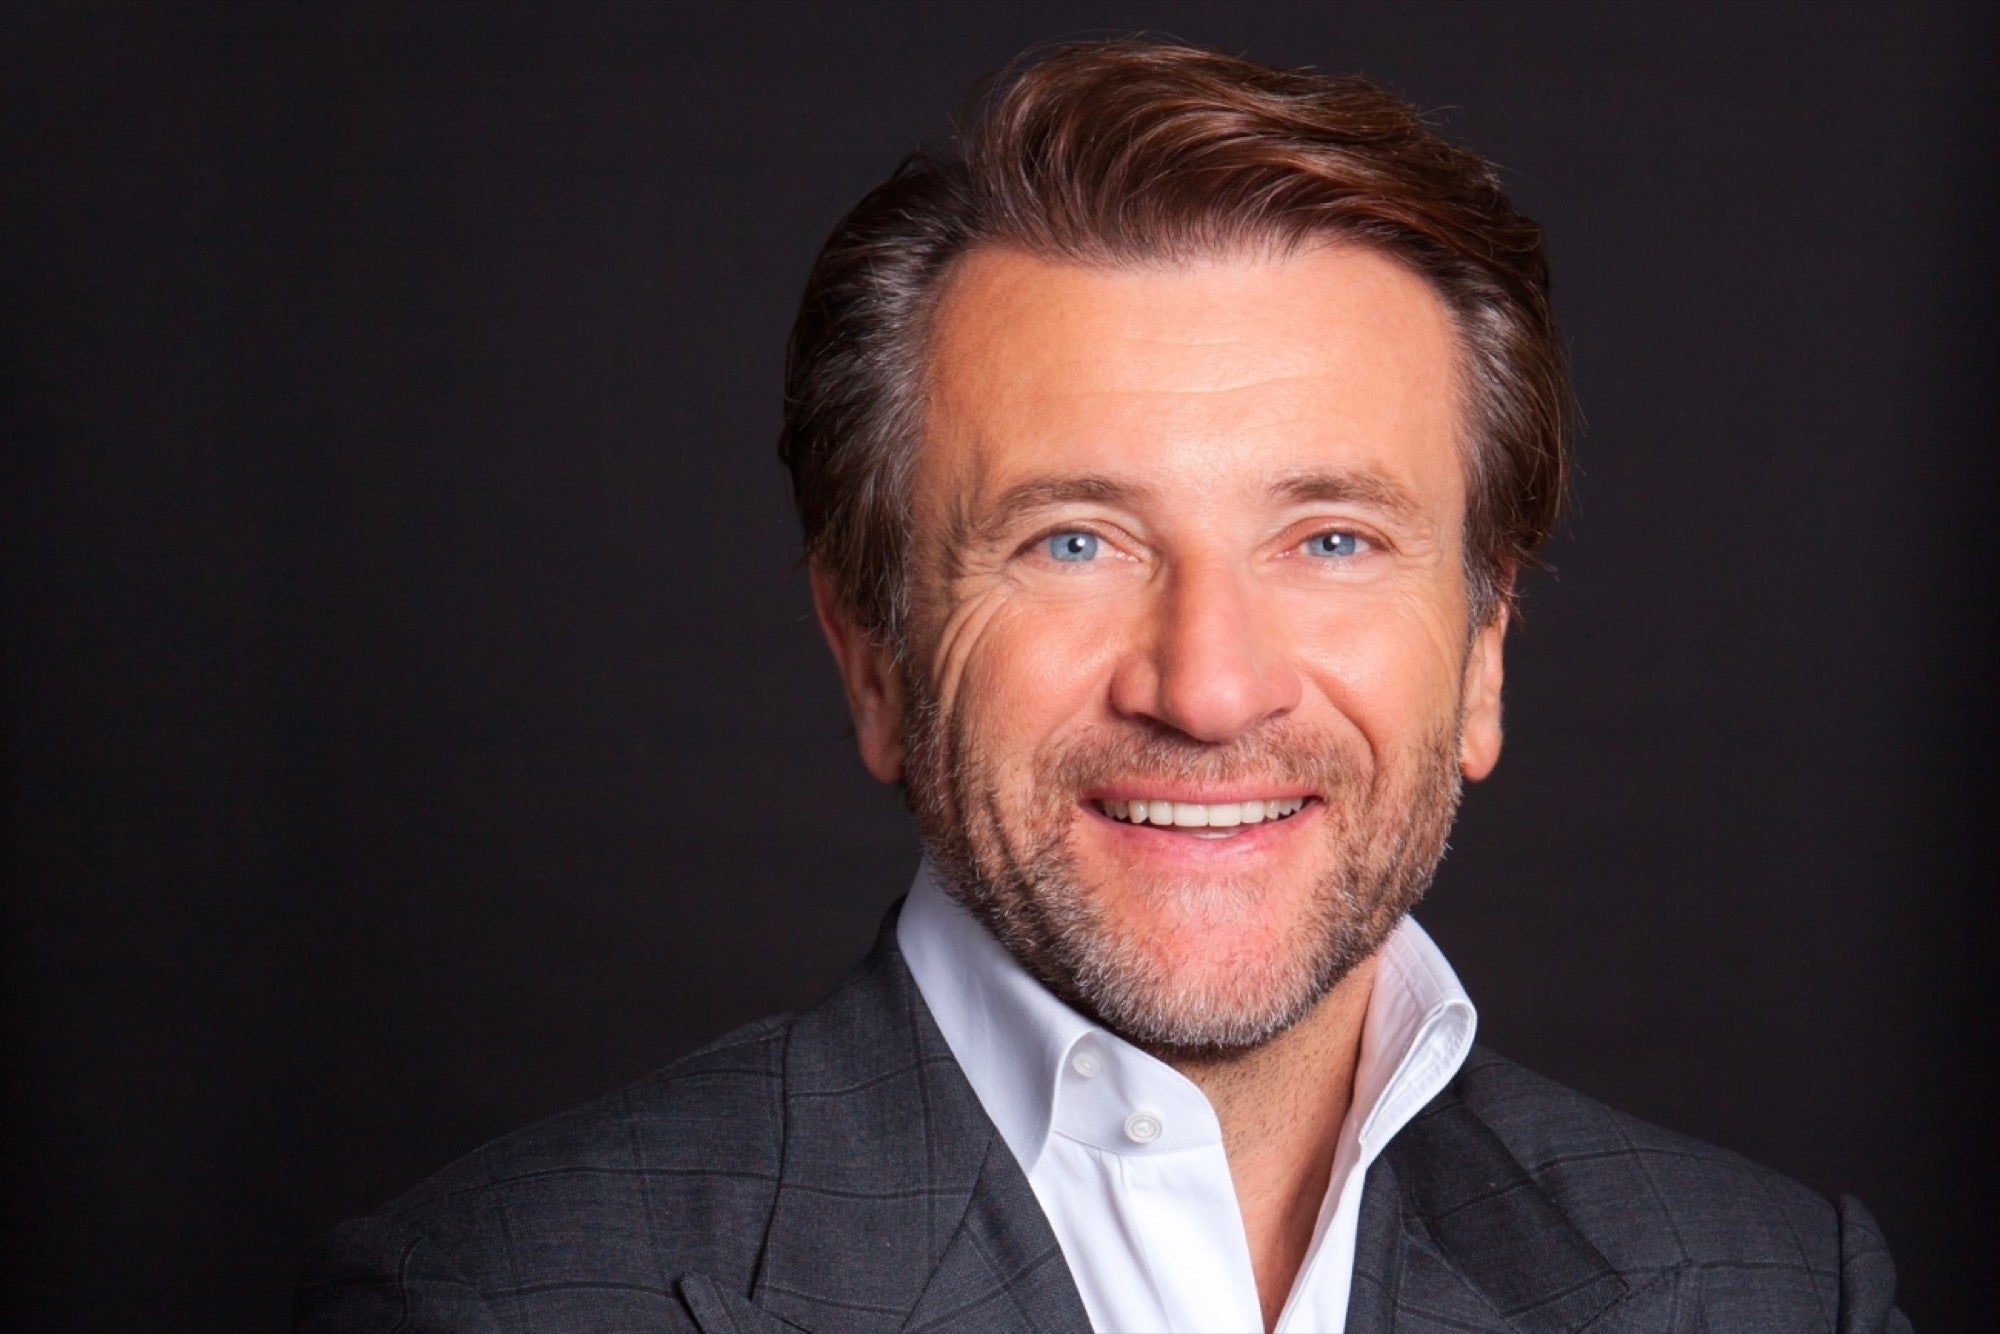 Shark Tank Star Robert Herjavec S Top 5 Small Business Marketing Tips